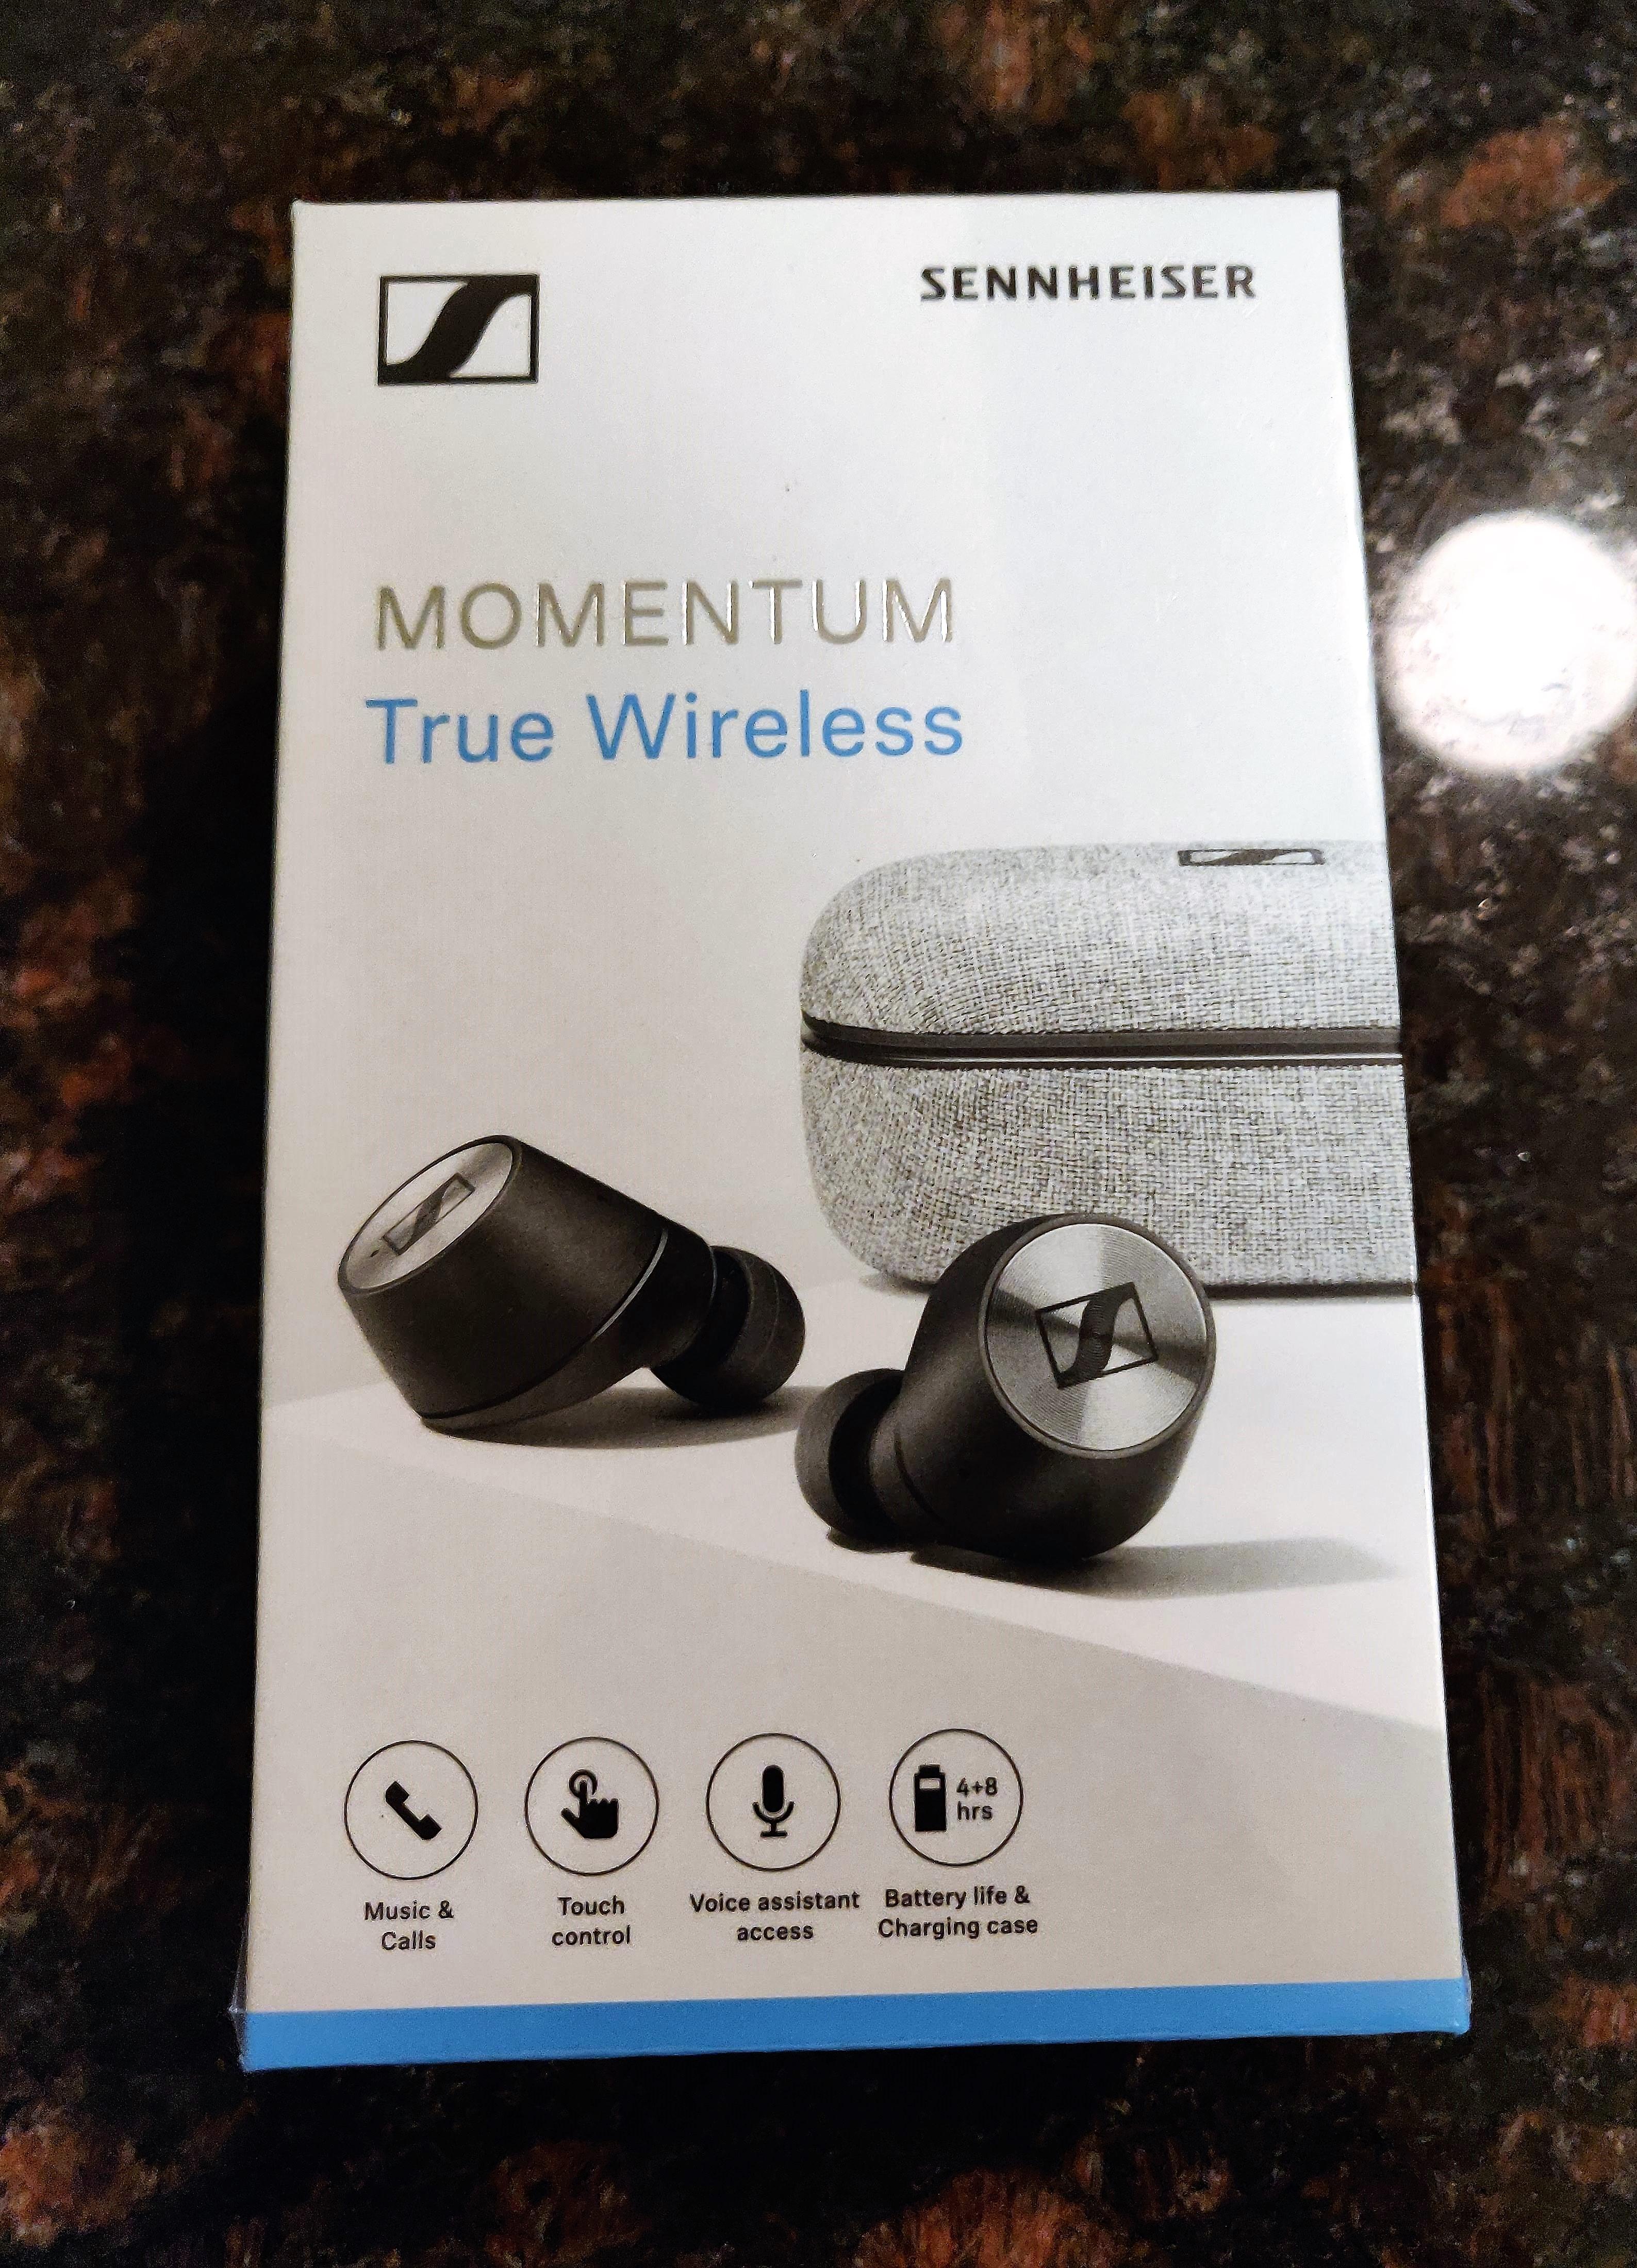 Sennheiser MOMENTUM True Wireless | Reviews | Headphone Reviews and